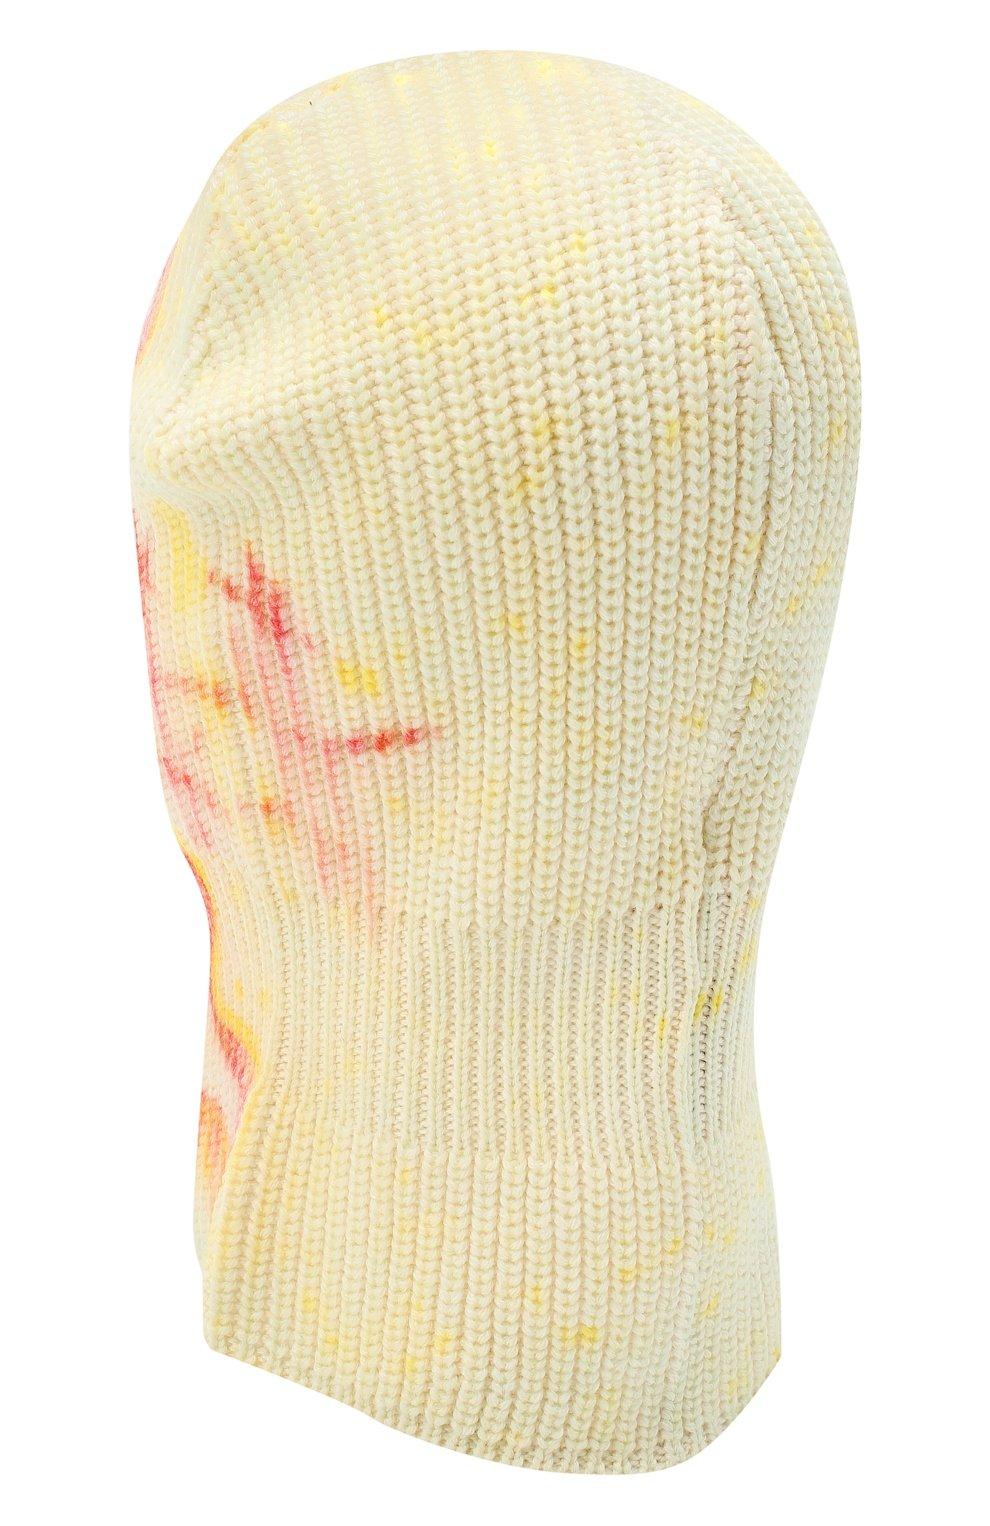 Мужская шапка-балаклава heron preston x kenny scharf HERON PRESTON разноцветного цвета, арт. HMLA004F20KNI0020130 | Фото 2